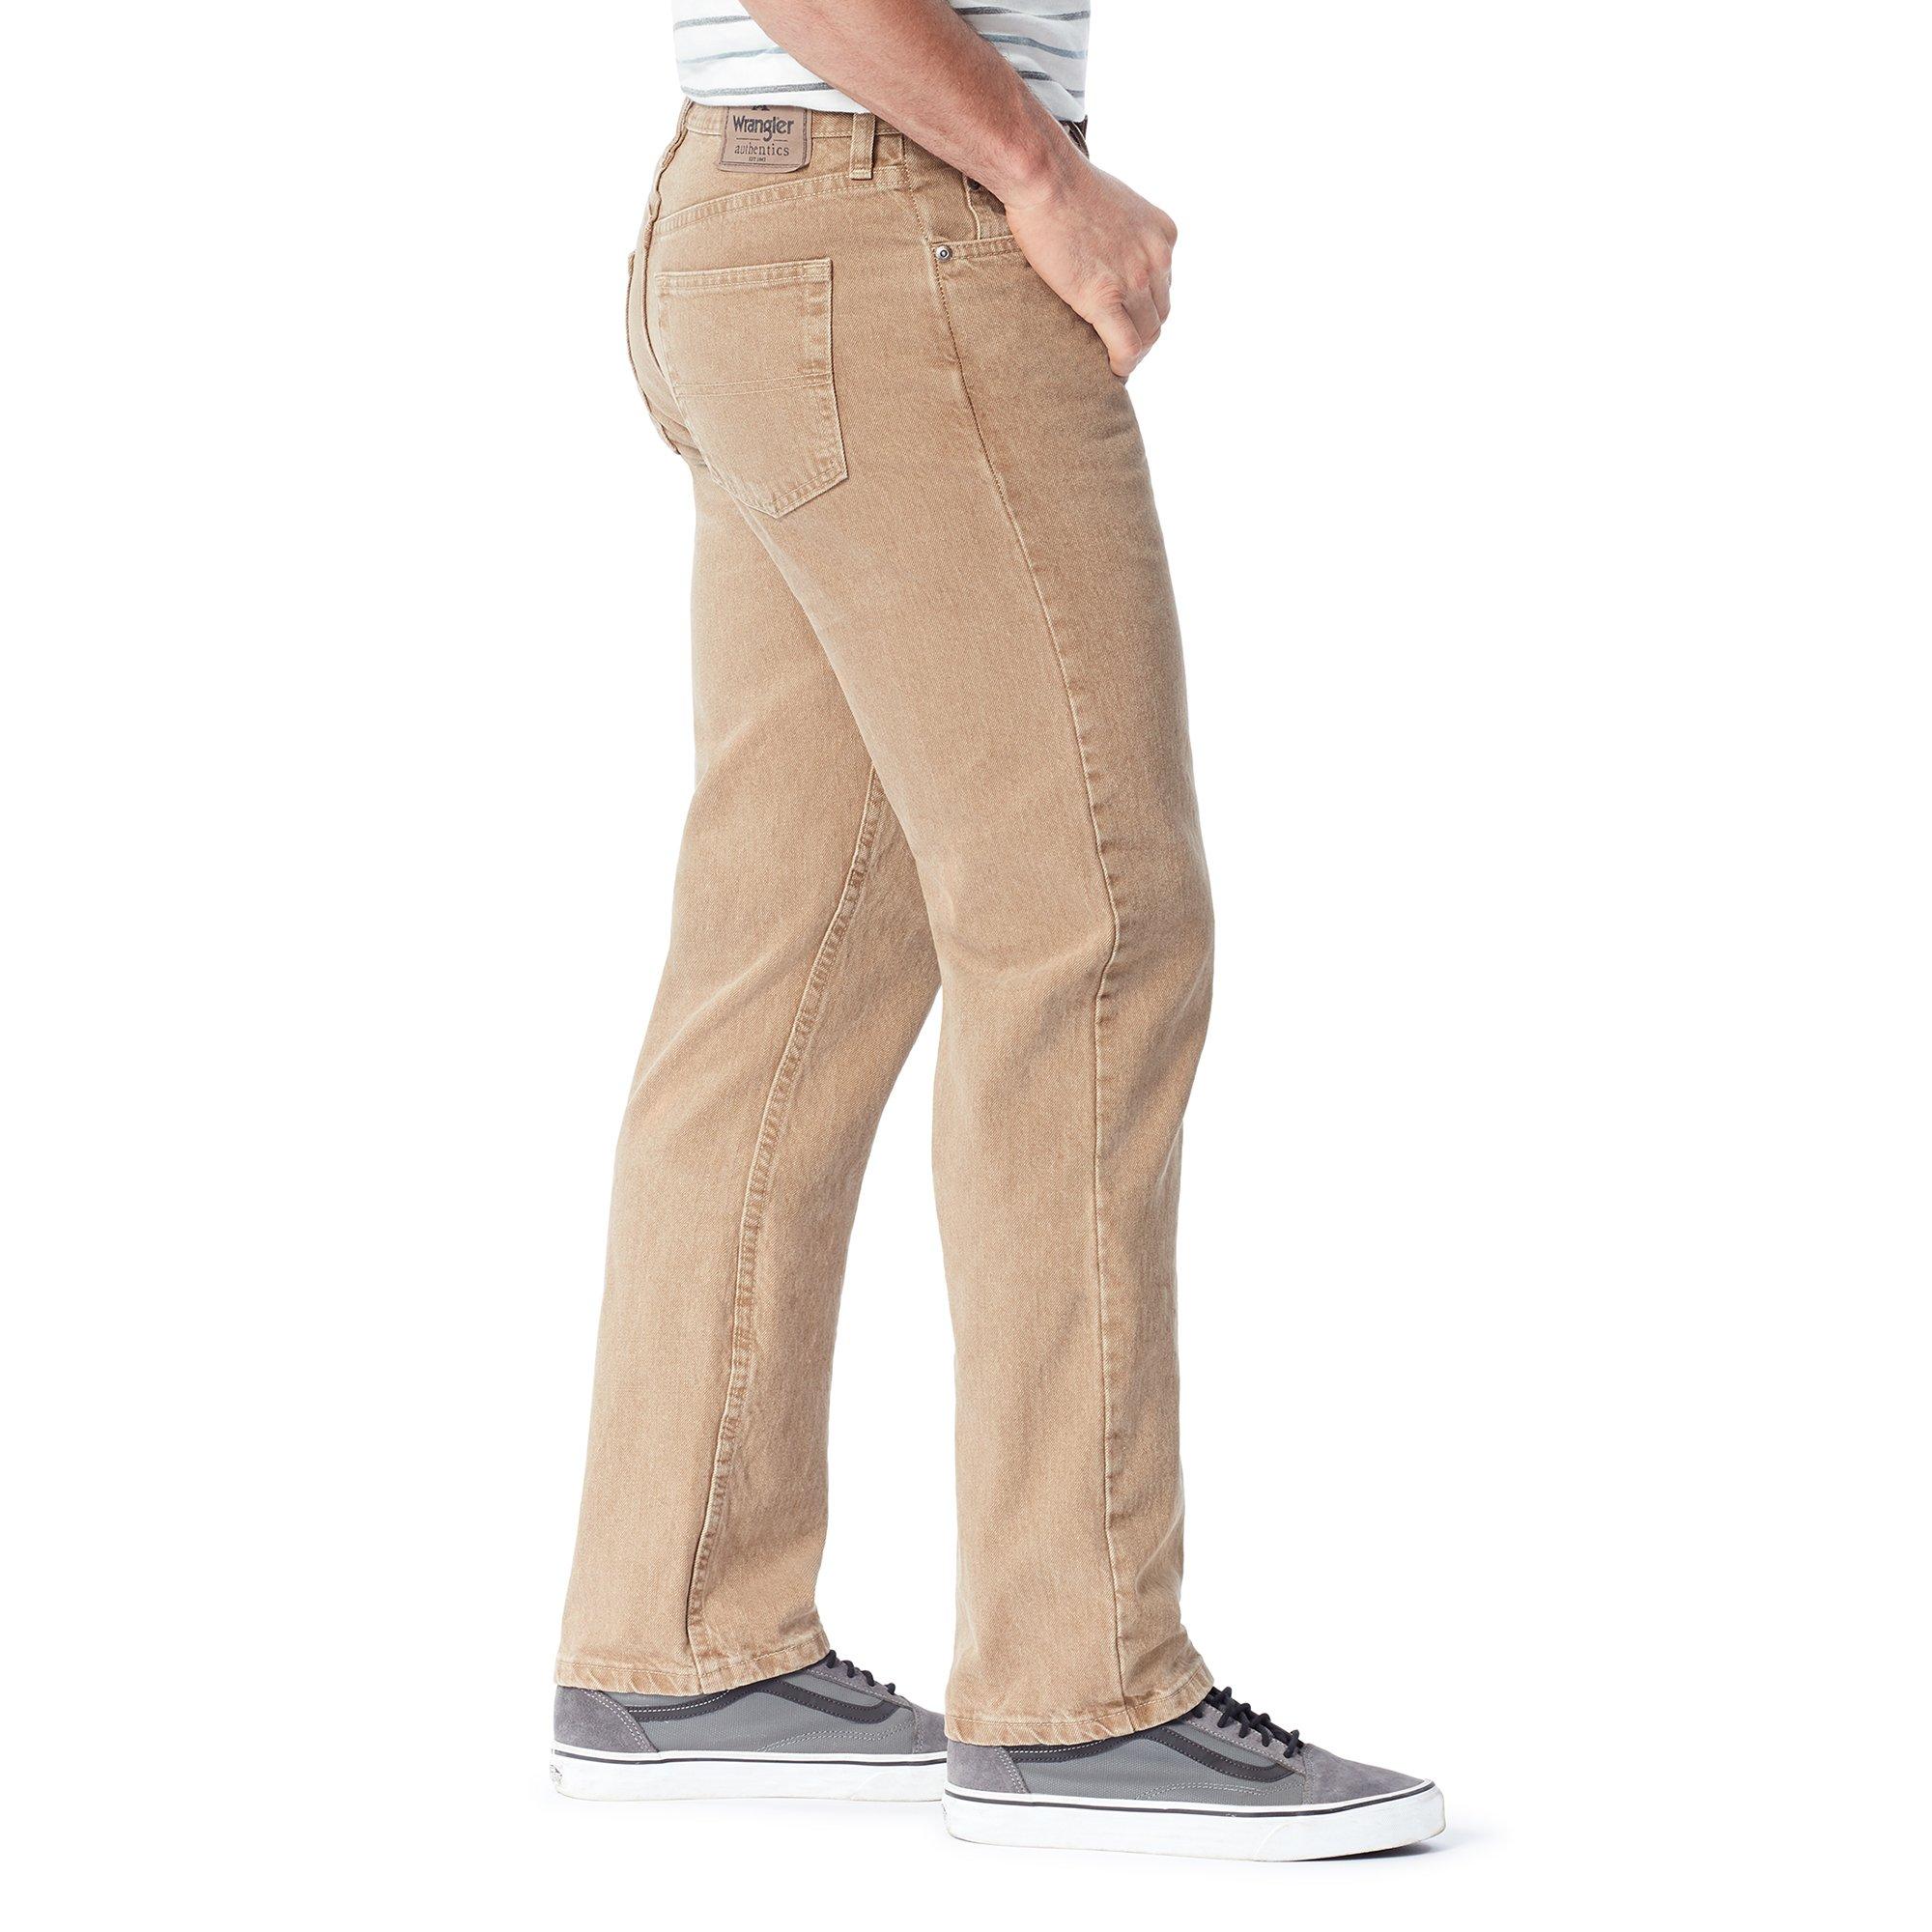 ba8b4e97 Wrangler Authentics Men's Classic 5-Pocket Regular Fit Jean,Khaki,42x28 -  ZM100KH-289-42x28 < Jeans < Clothing, Shoes & Jewelry - tibs